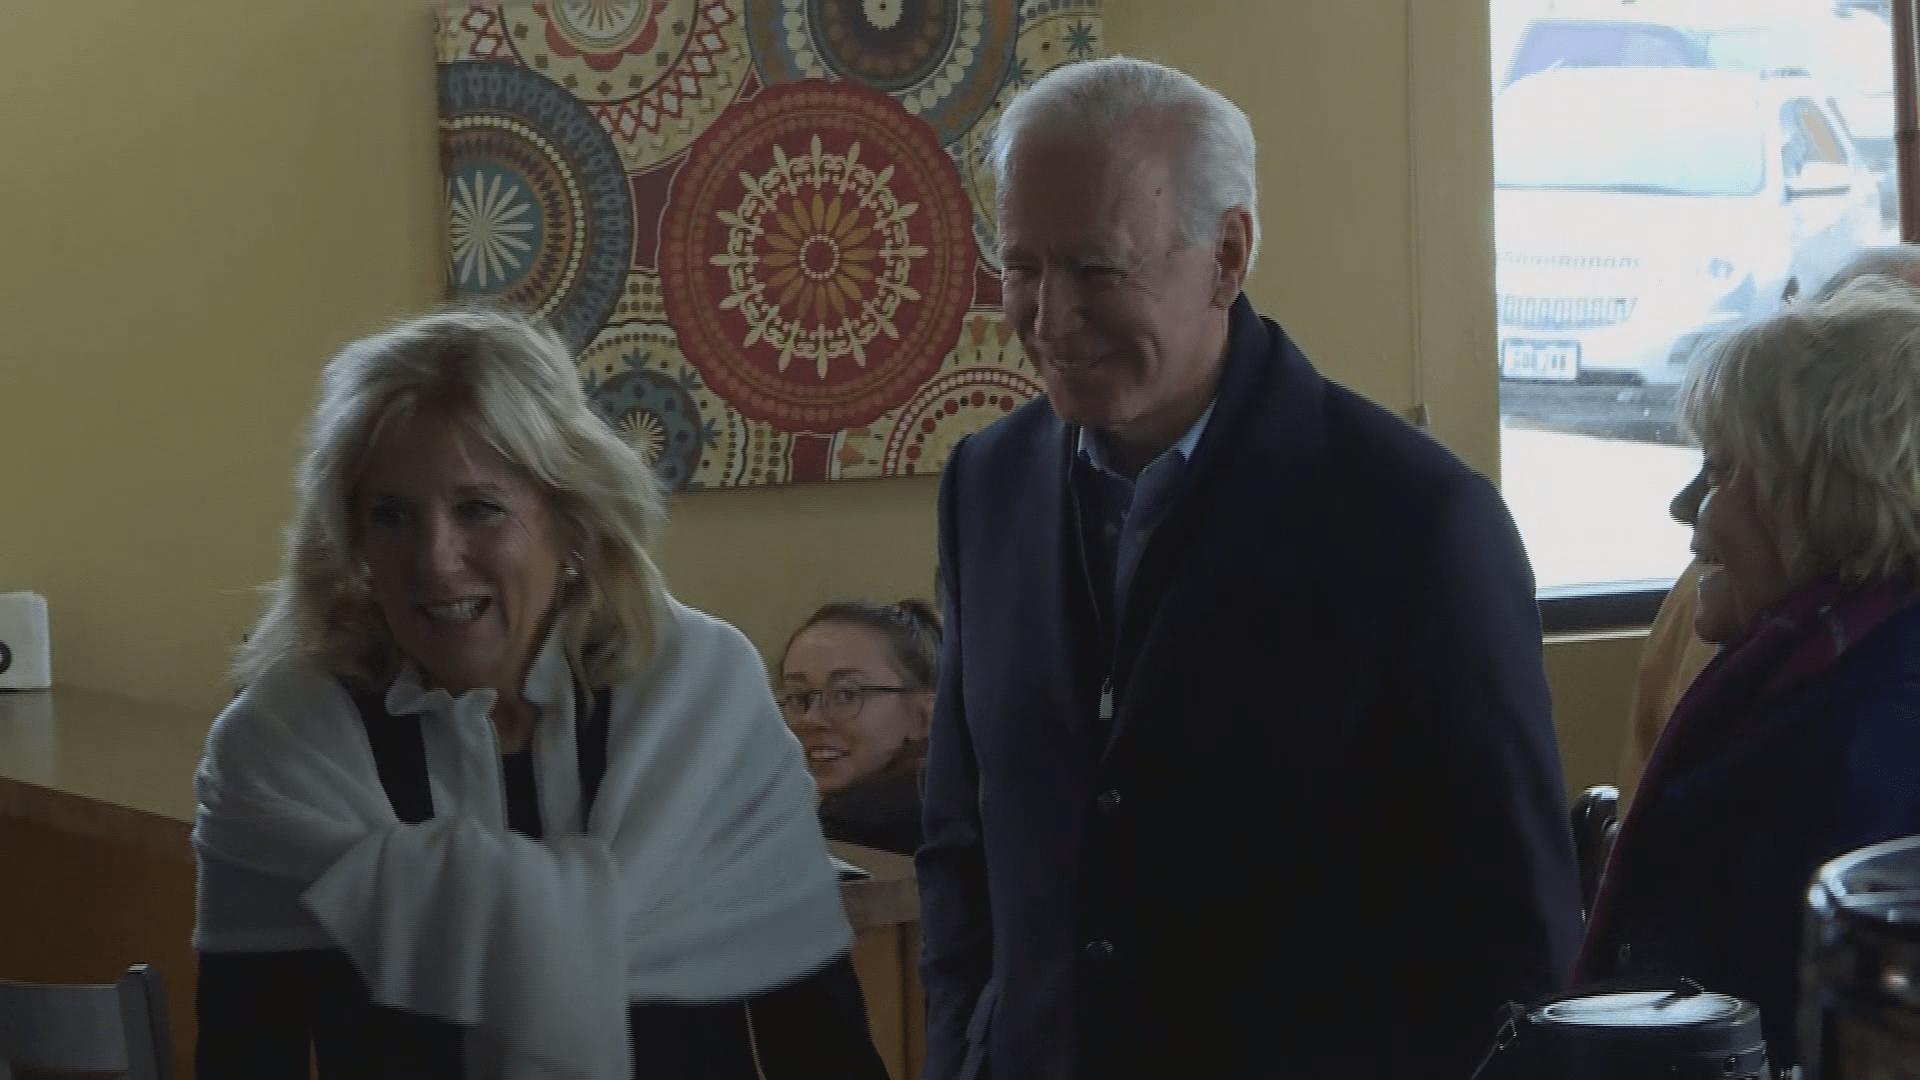 Biden Continues 'No Malarkey' Campaign Tour Around Iowa 1